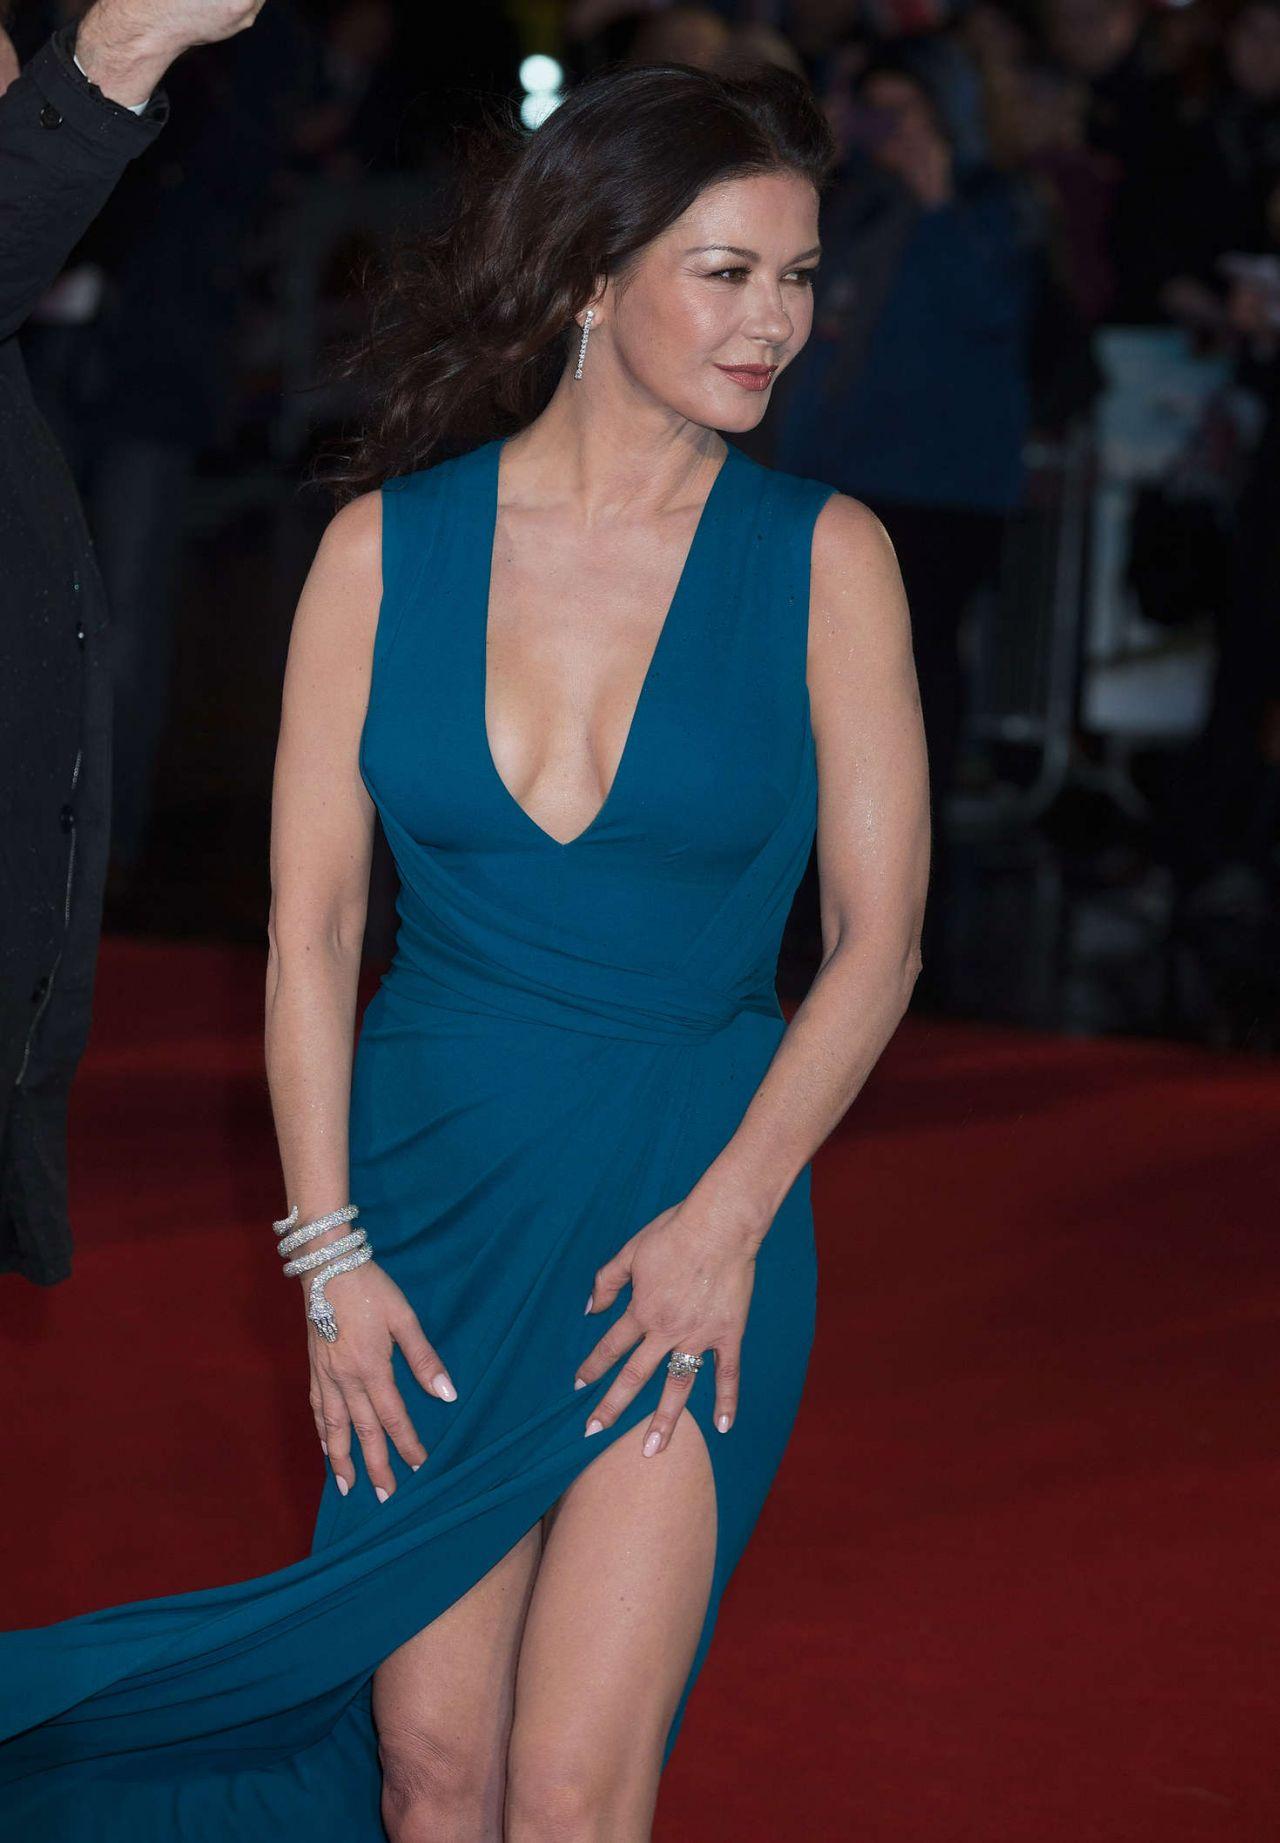 Catherine Zeta Jones – 'Dad's Army' FIlm Premiere in London Catherine Zeta Jones